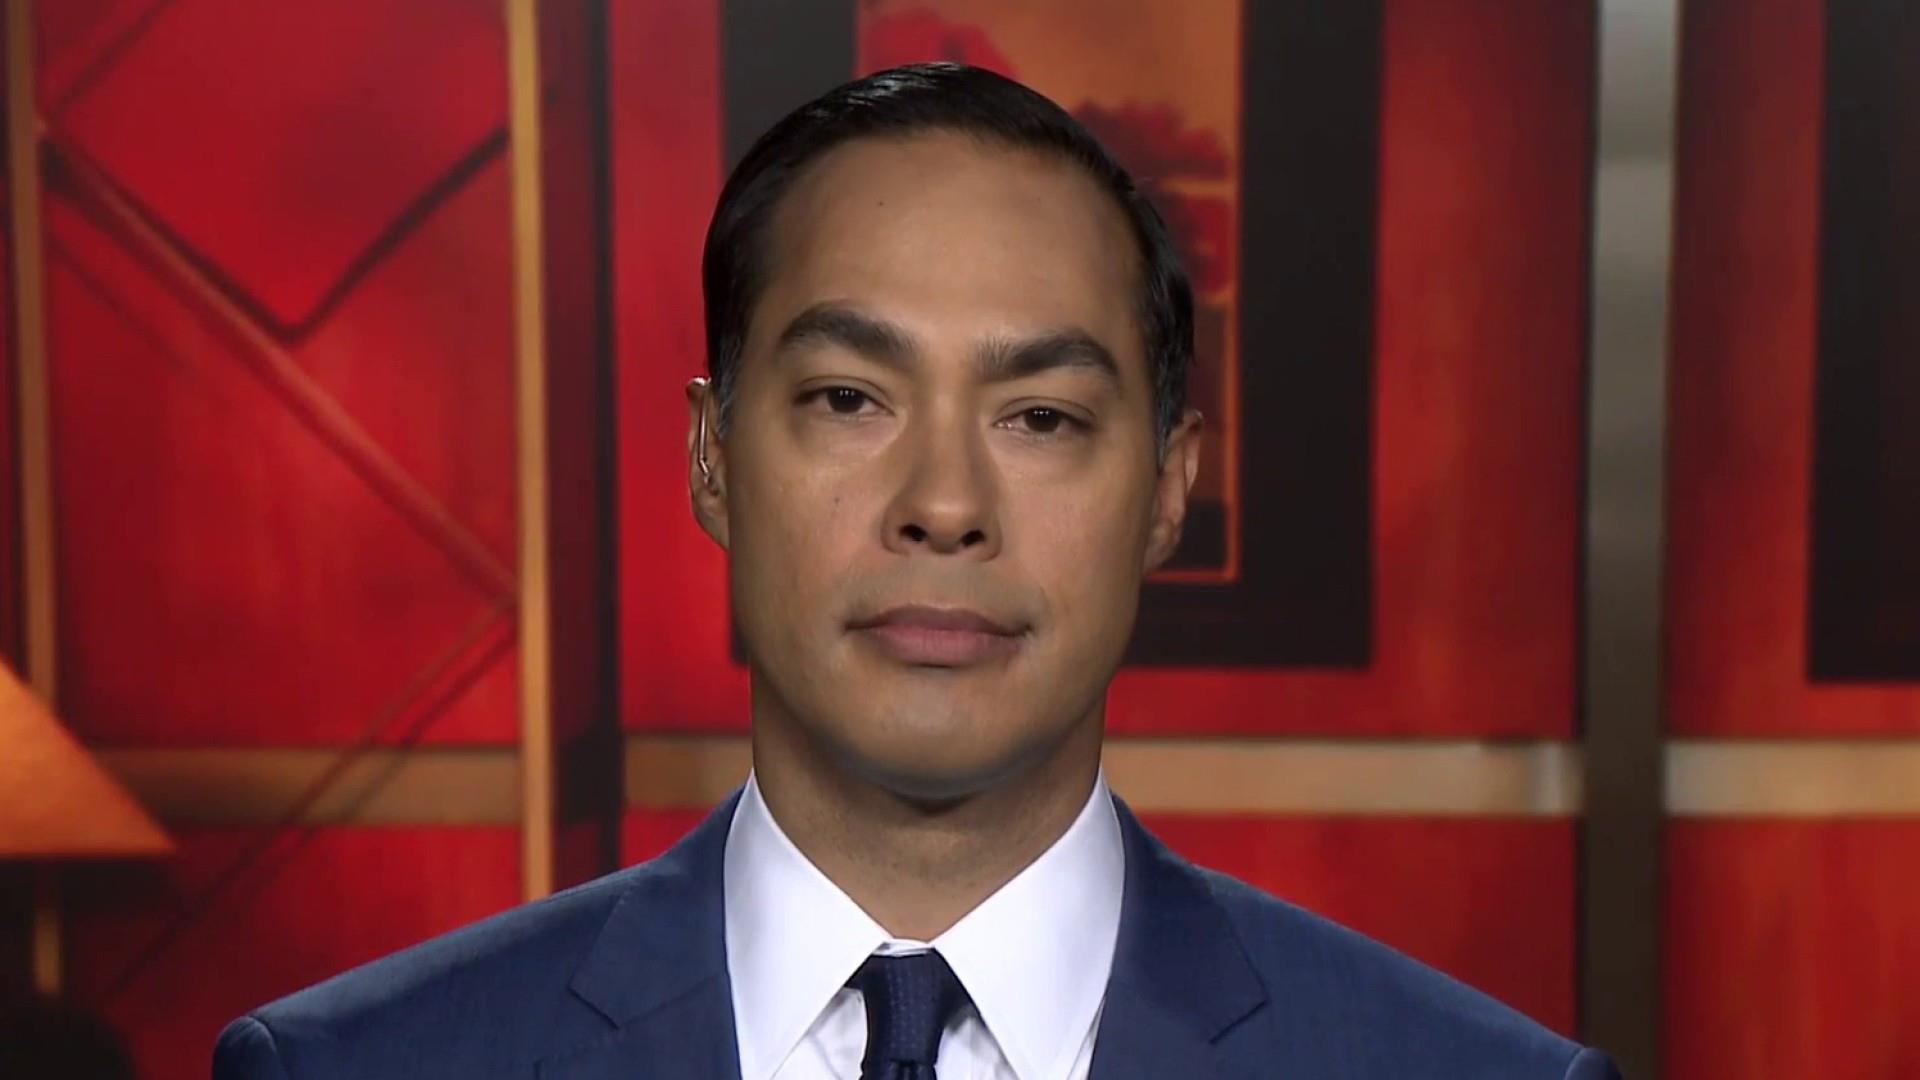 2020 contender Julian Castro responds to 'send her back'